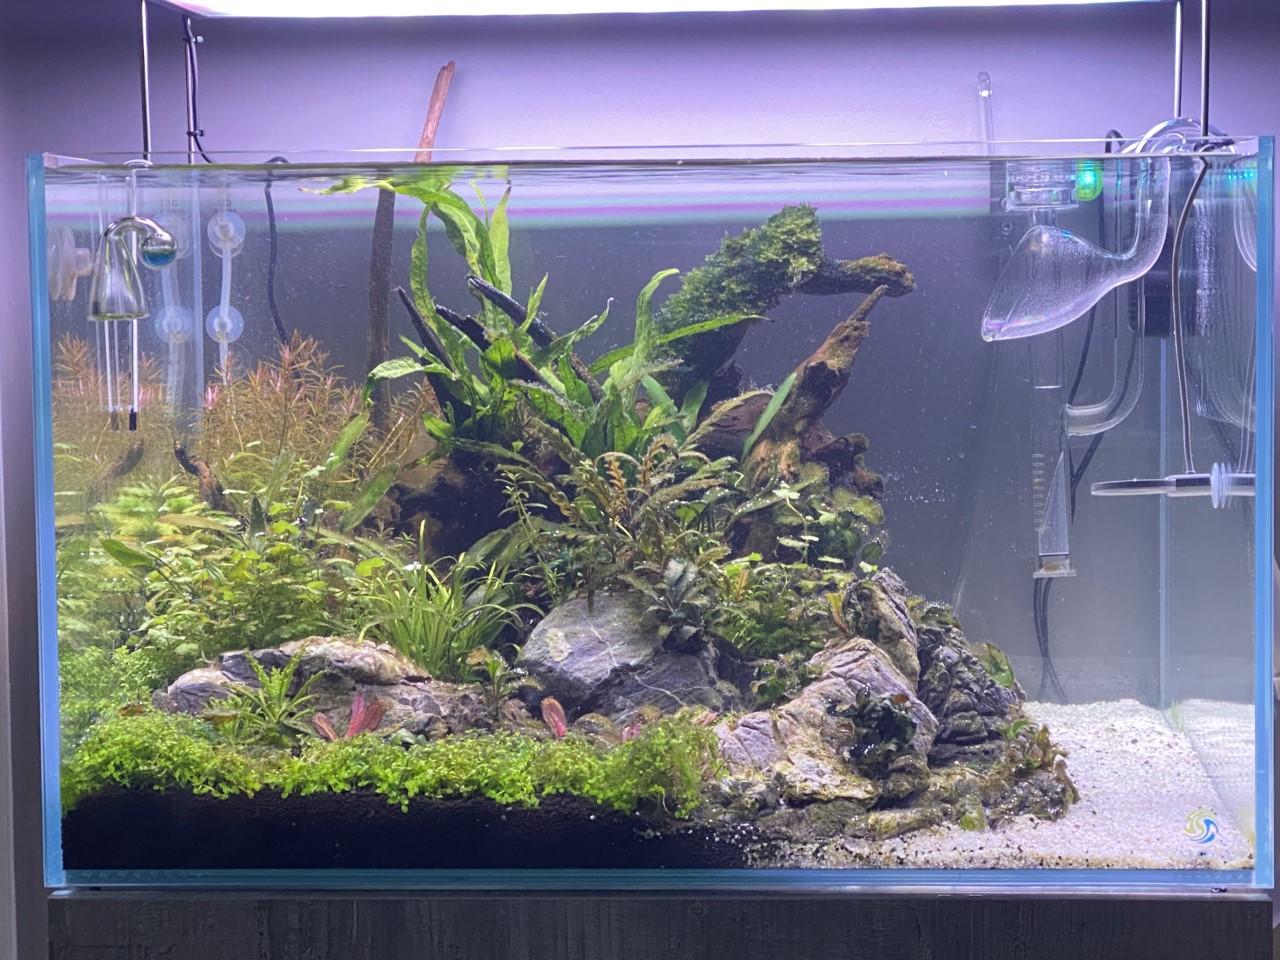 19 fish tank 15.4.20.jpg